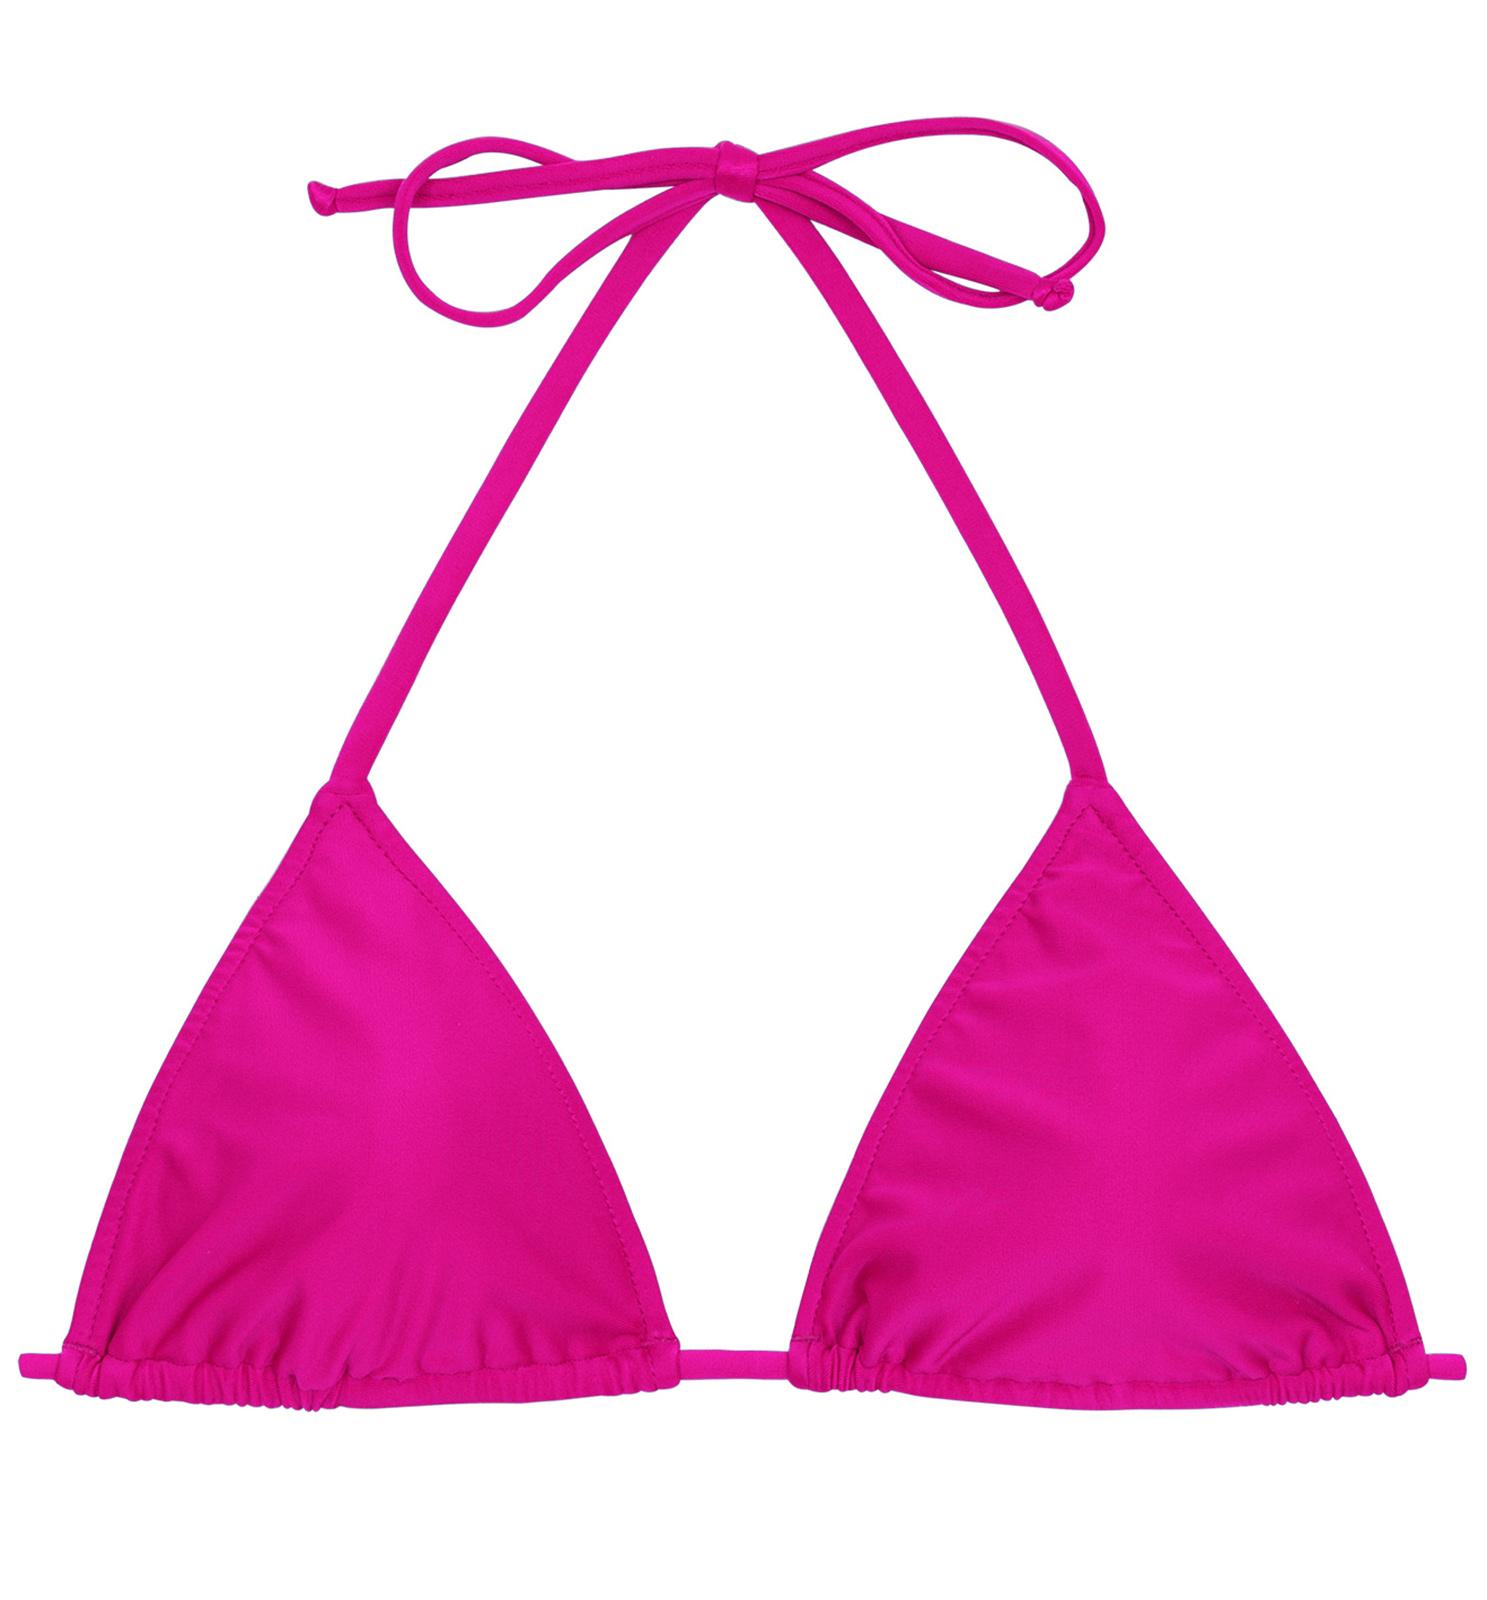 4756a647c0 Bikini Tops Pink Fuchsia Triangle Bikini Top - Top Amaranto Lacinho